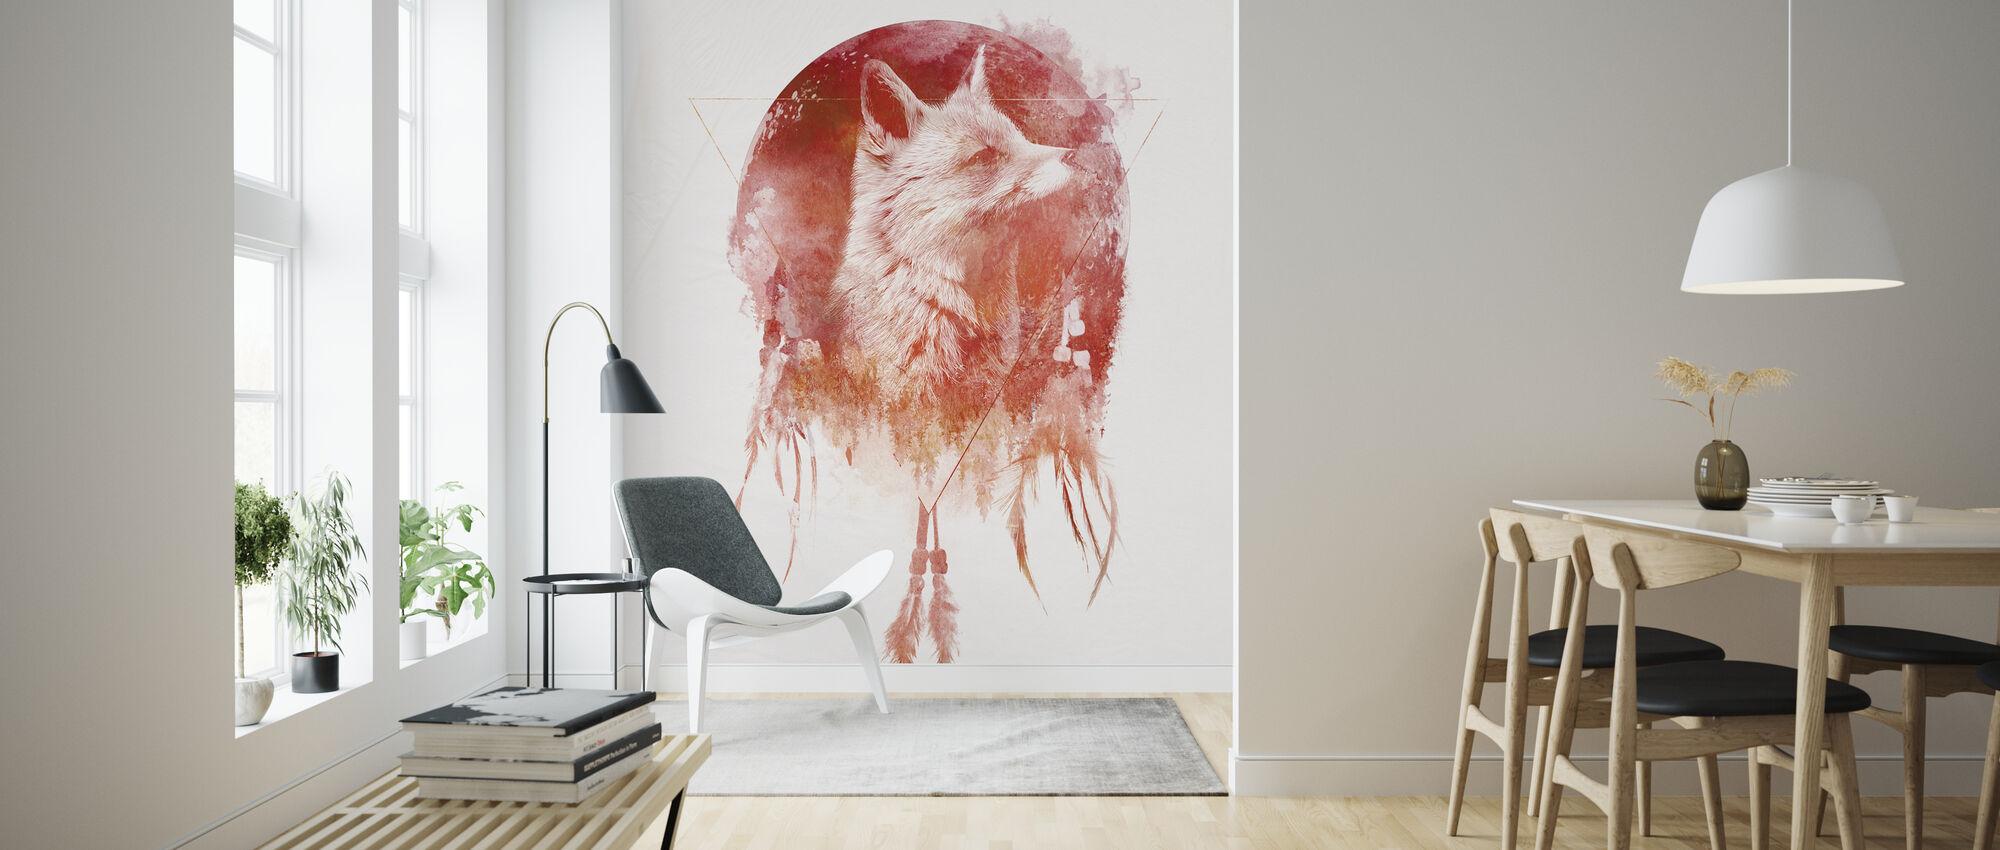 Dreamcatcher Wolf - Wallpaper - Living Room